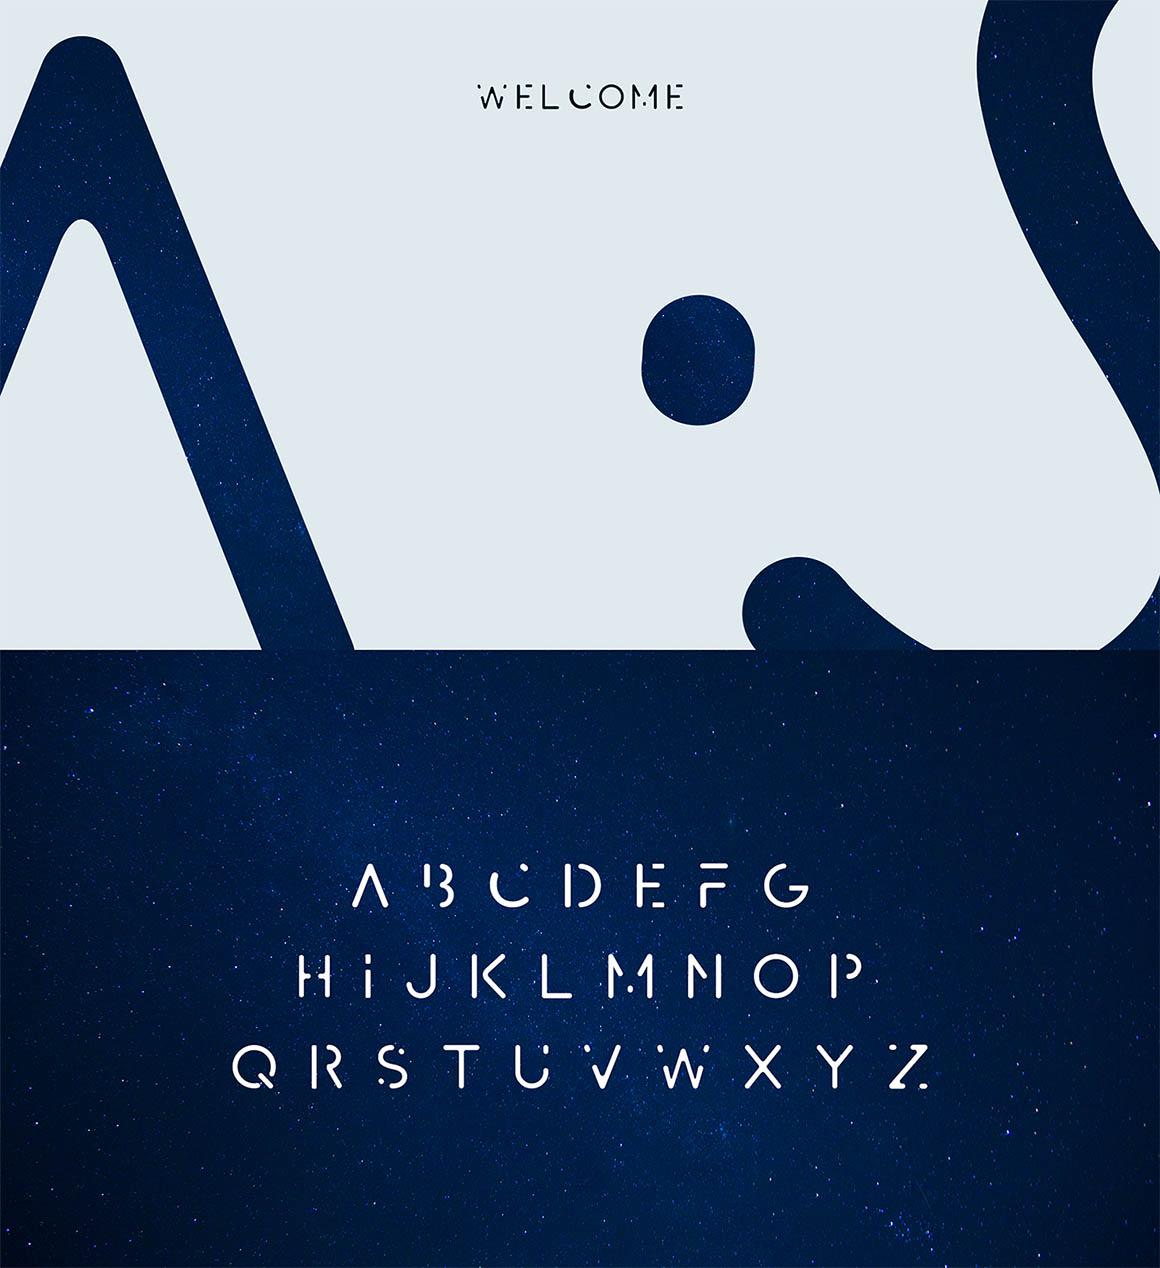 Avayx-free-font-2